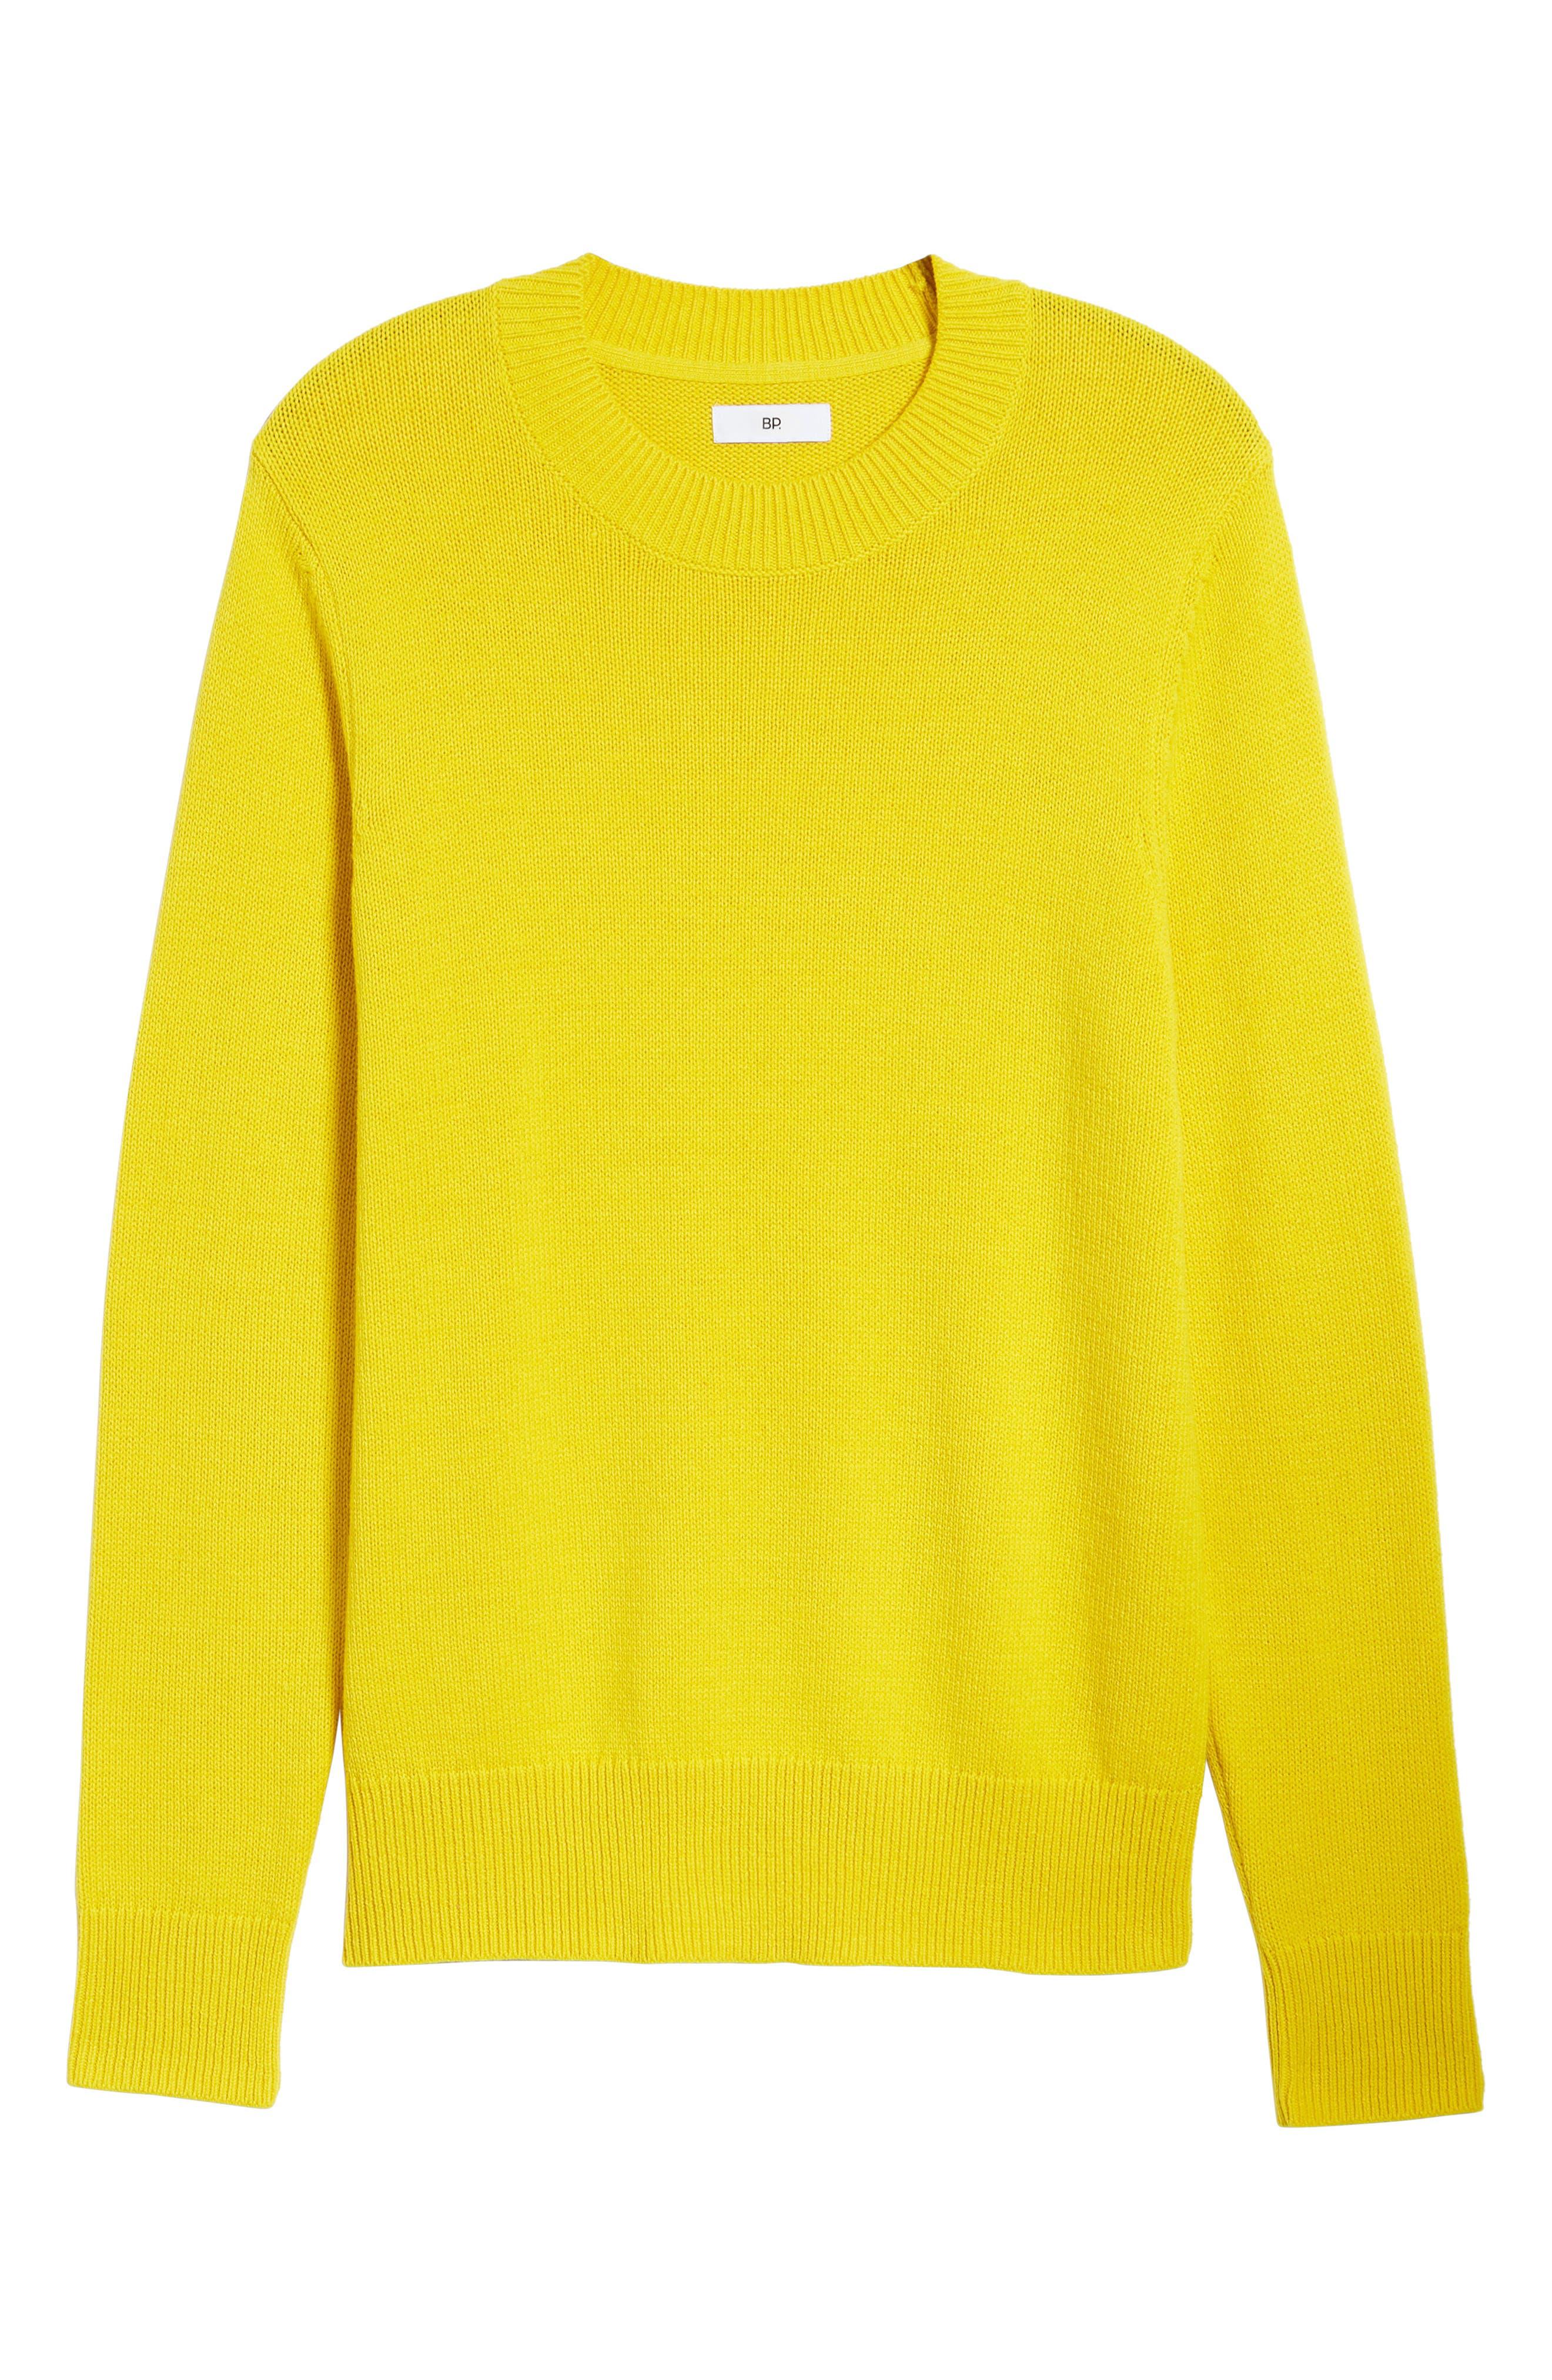 Crewneck Sweater,                             Alternate thumbnail 6, color,                             YELLOW SULPHUR